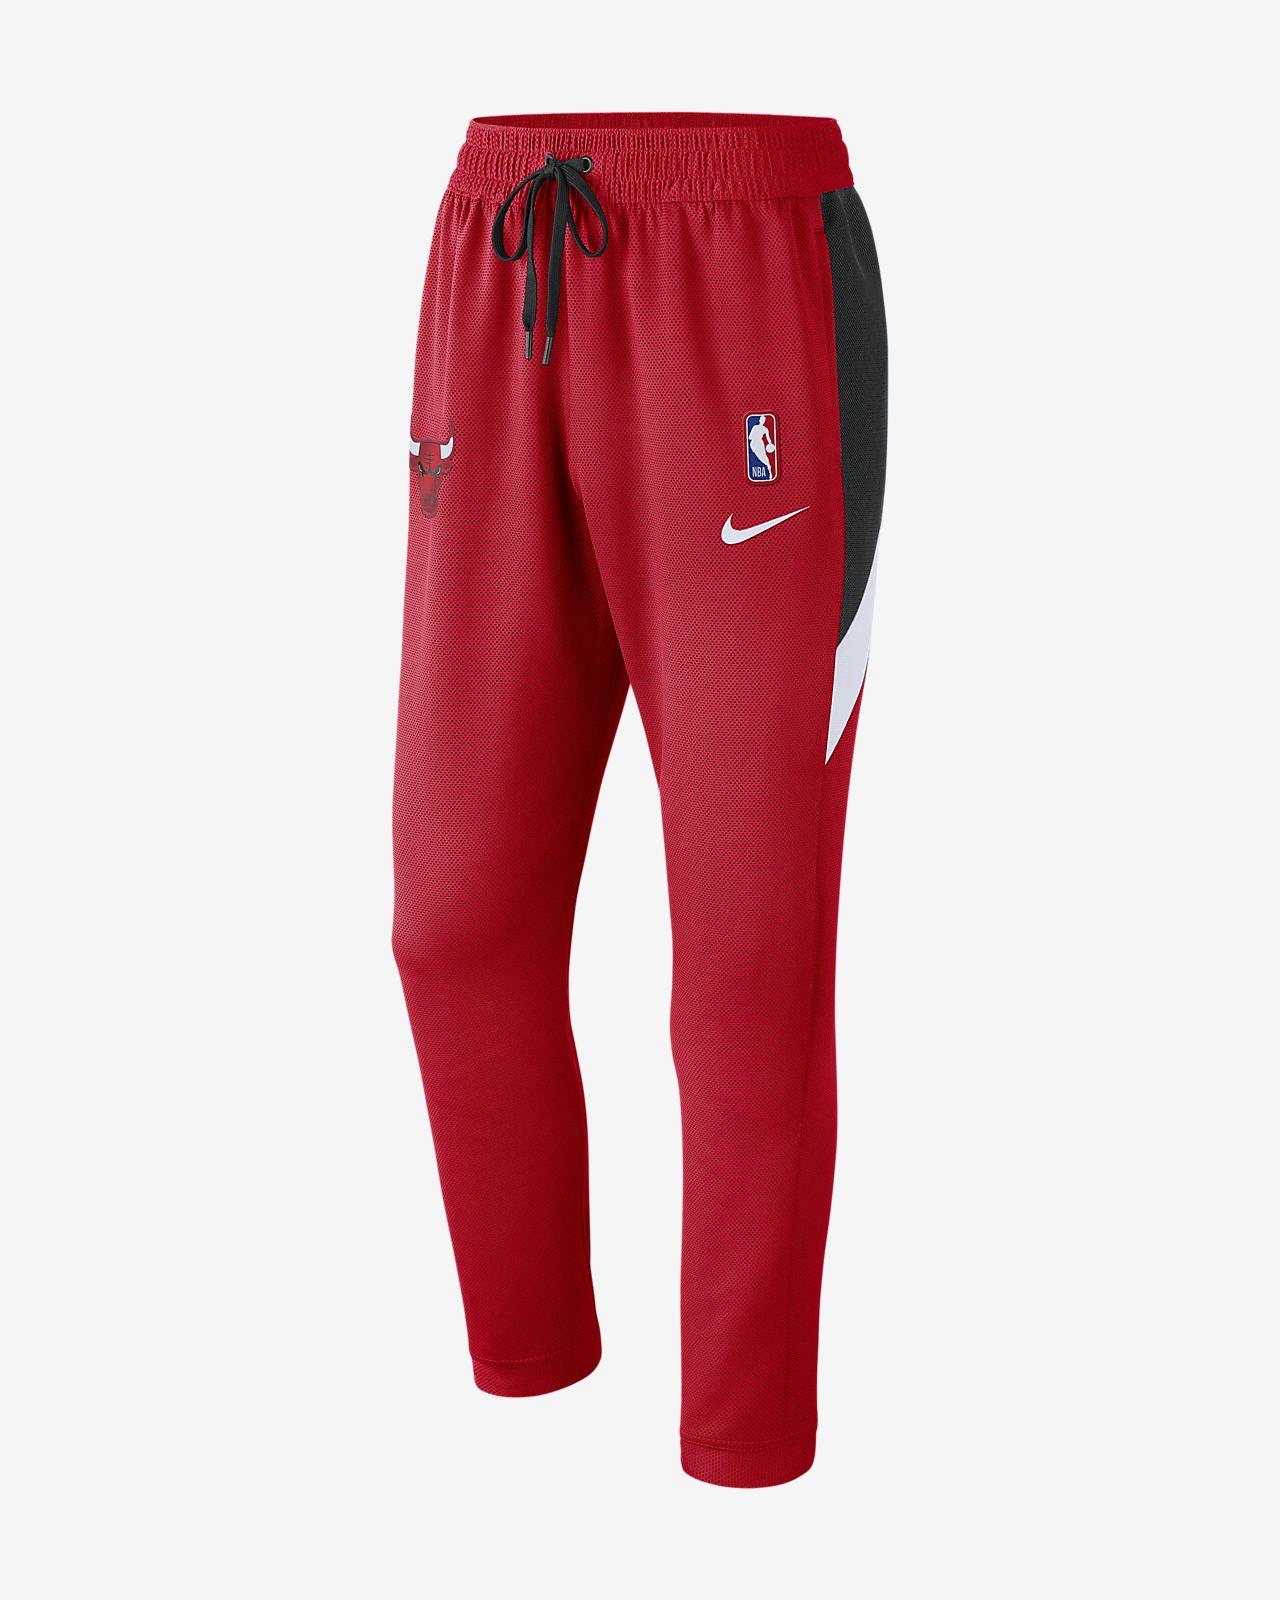 Pantaloni Chicago Bulls Nike Therma Flex Showtime NBA - Uomo